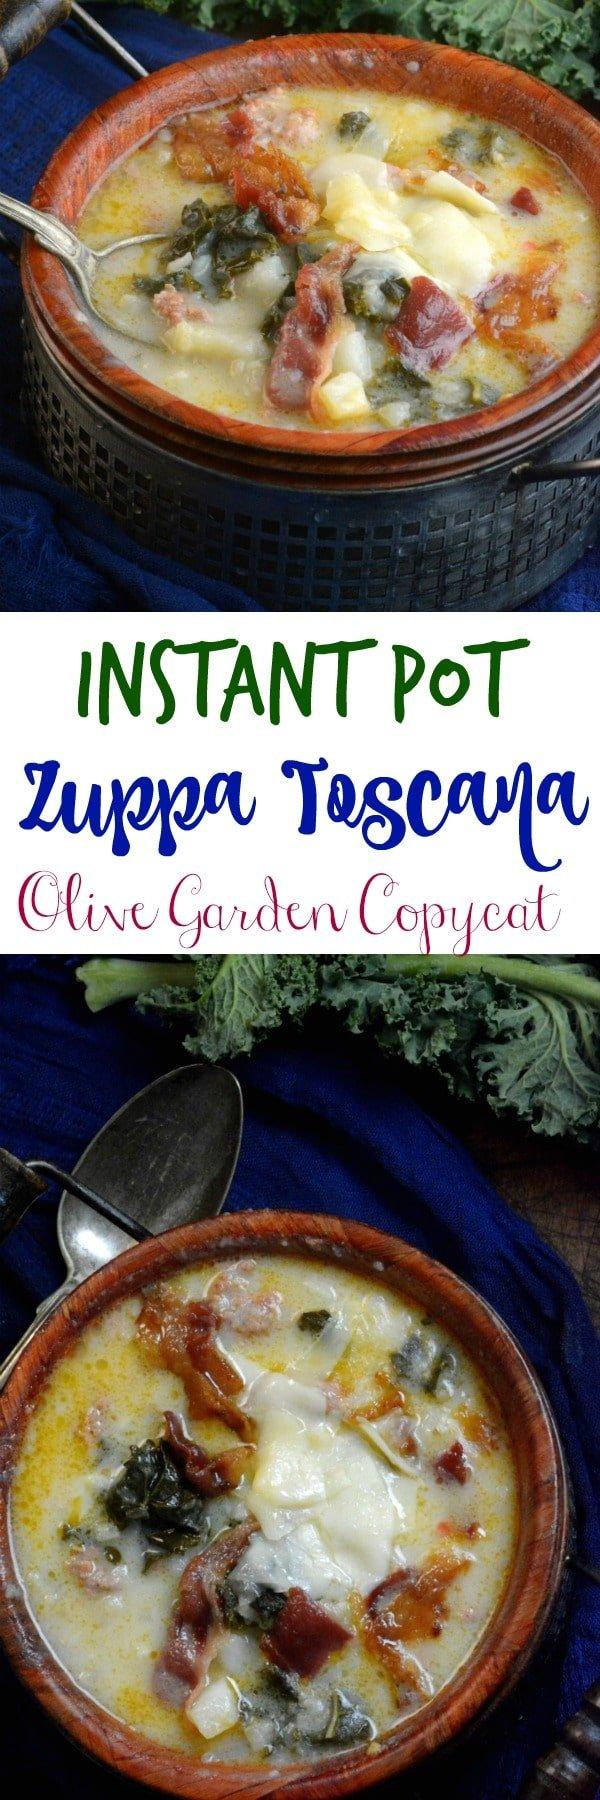 Zuppa toscana olive garden copycat instant pot soup for Olive garden copycat zuppa toscana